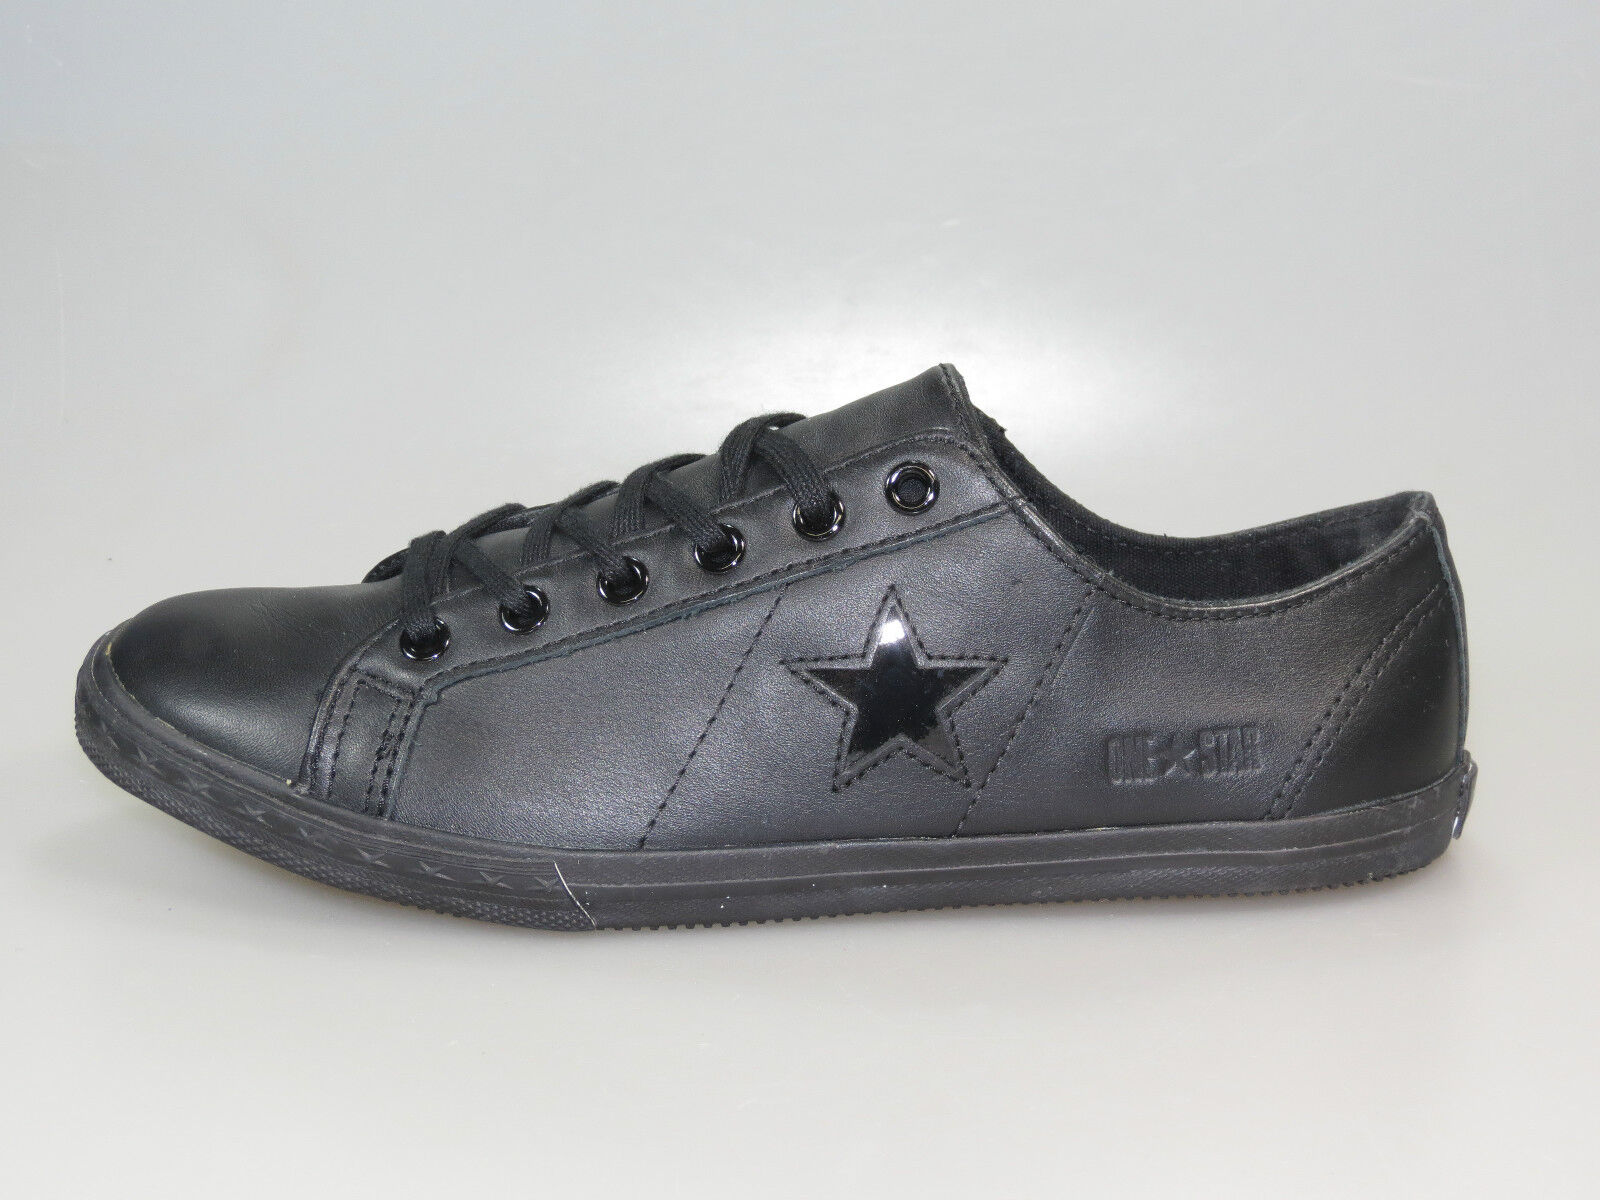 Converse Chucks AllStar OS PRO LOW OX 108736 BLACK Schwarz +NEU+ Größe 37 & 37,5